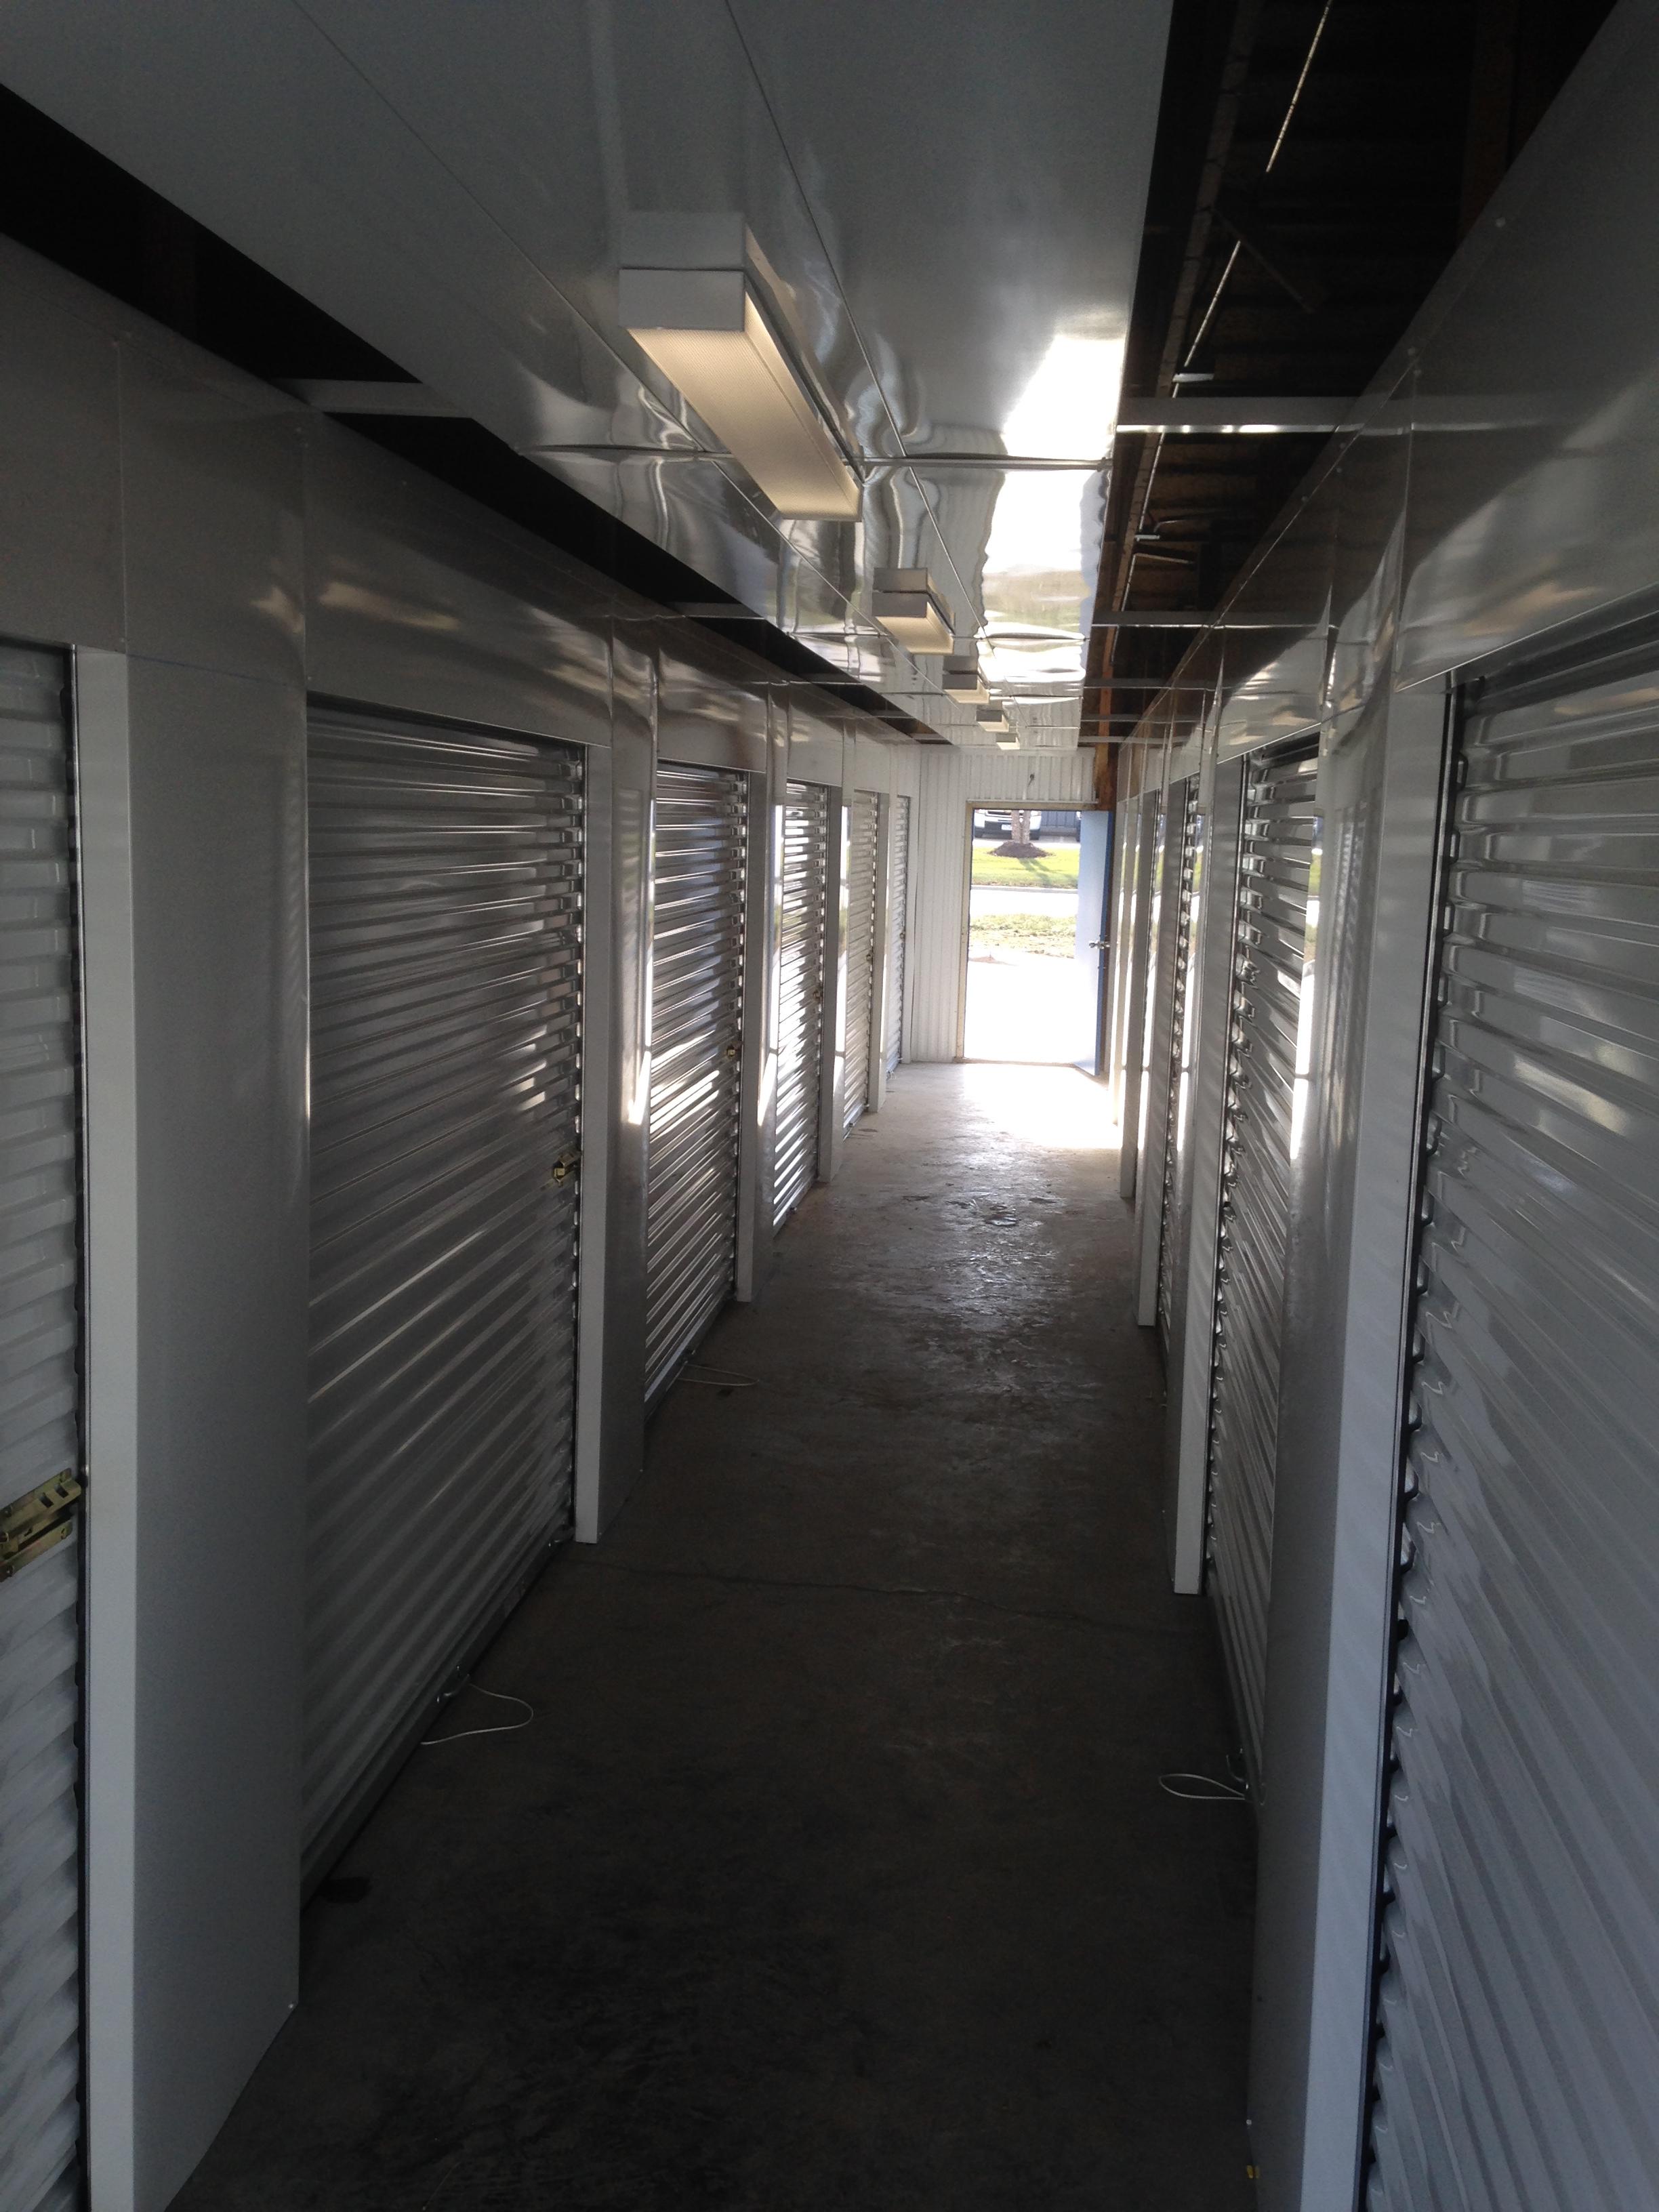 Interior Hallway 24 Hour Self Storage Facility In